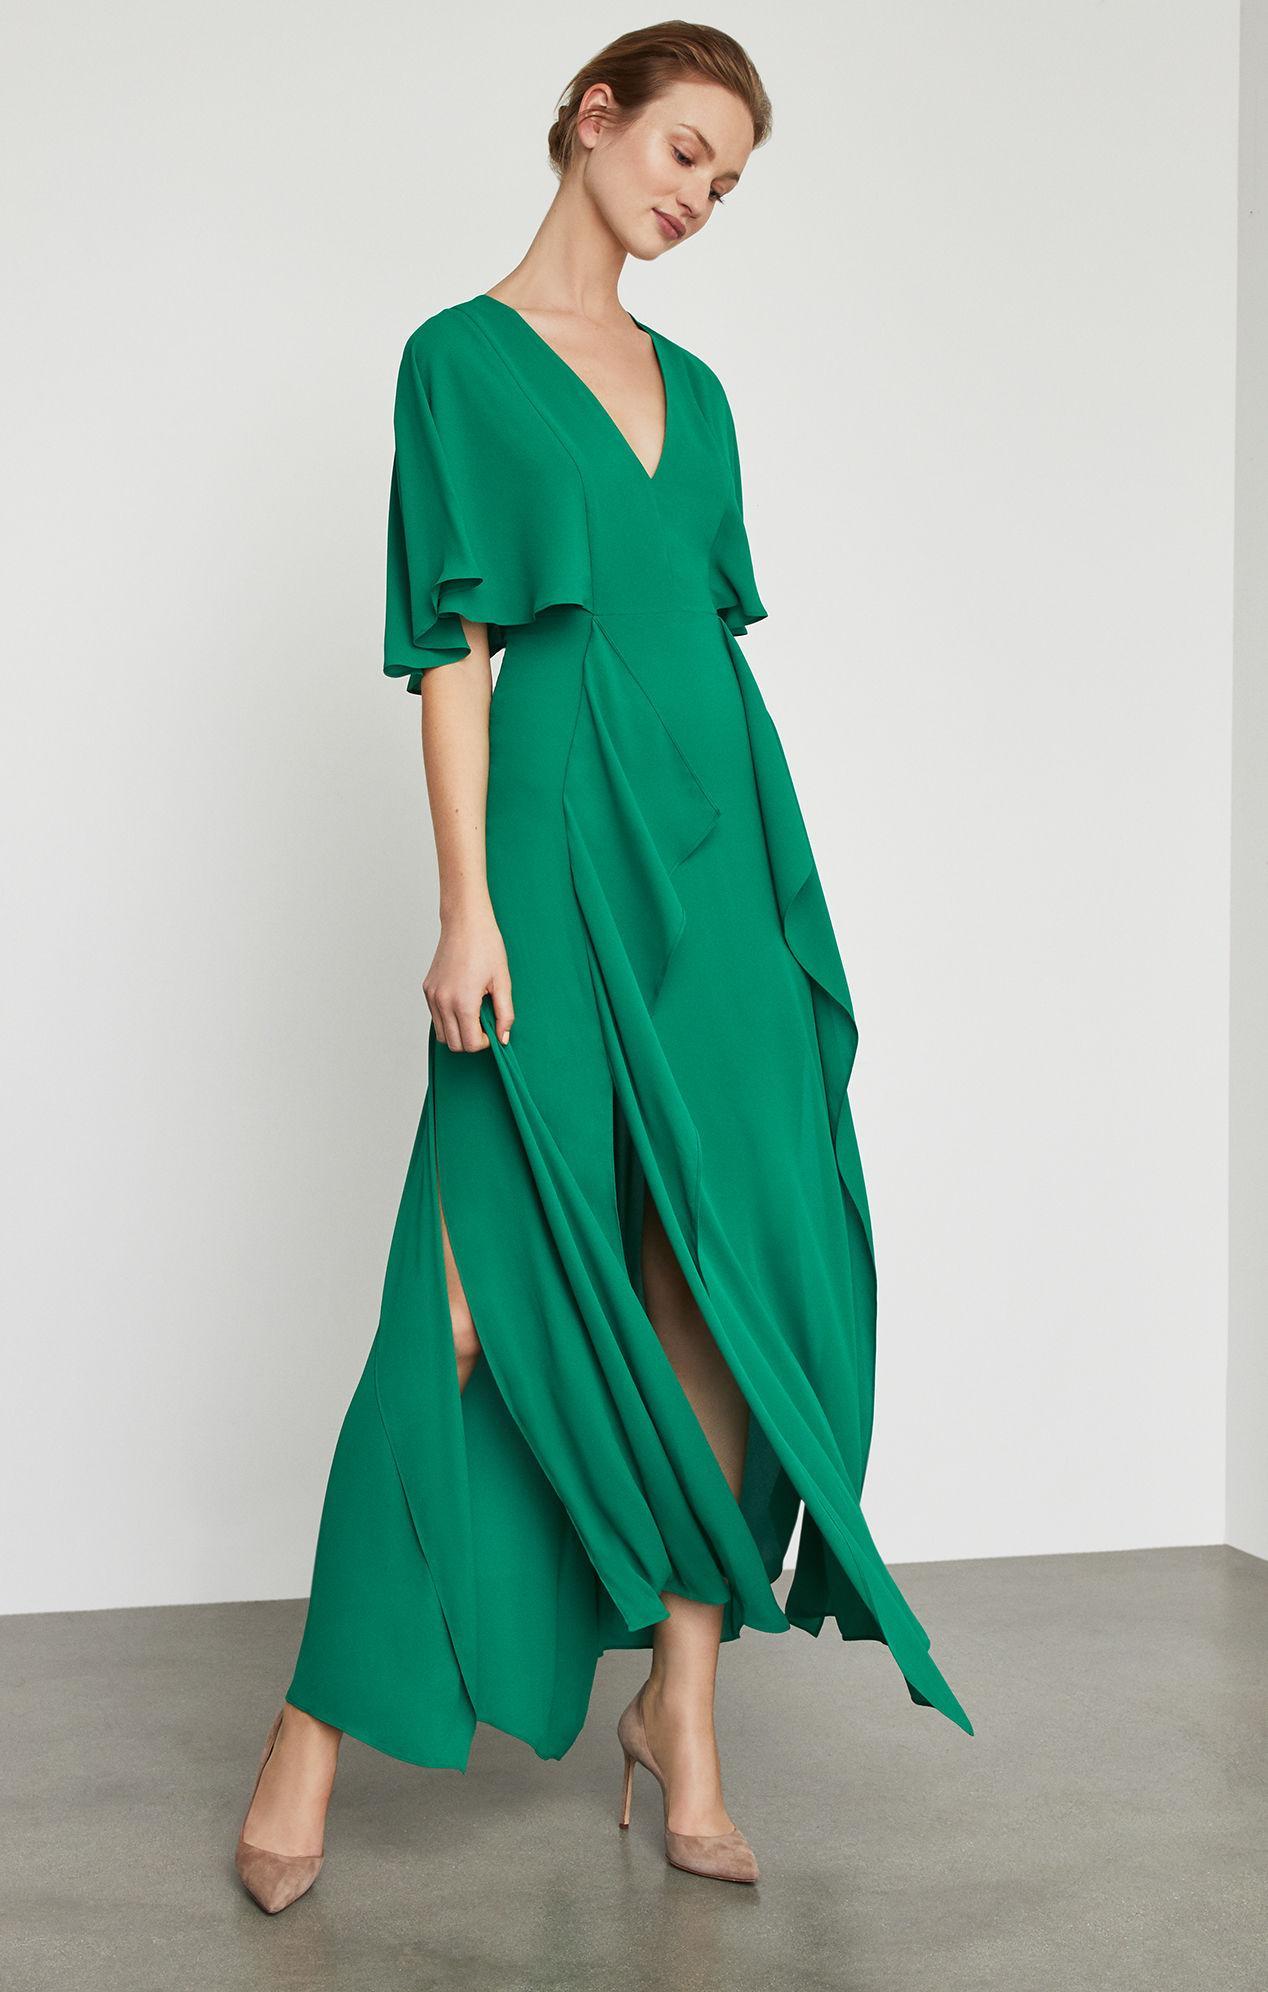 818d7377b8 BCBGMAXAZRIA Bcbg Cape Sleeve Maxi Dress in Green - Save 5% - Lyst